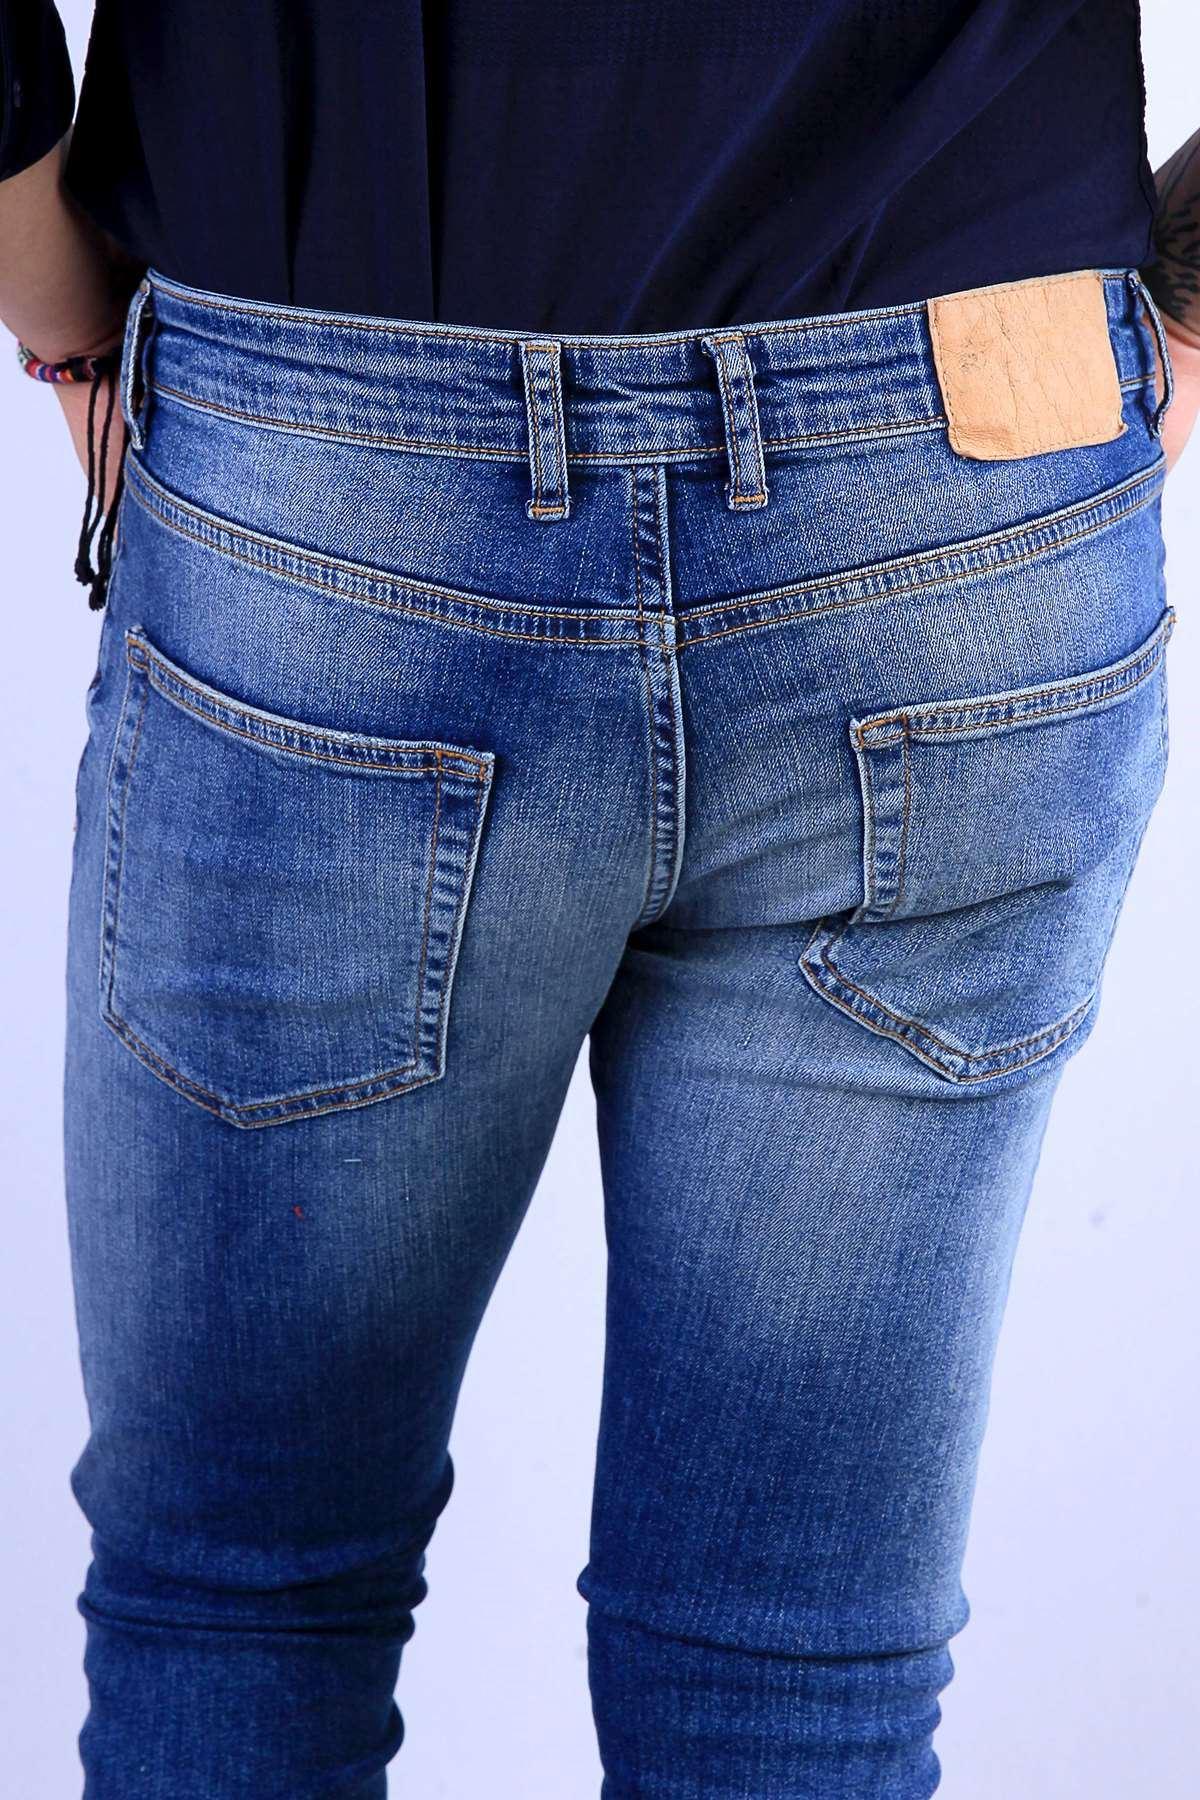 Paça Lazer Kesikli Diz İp Yamalı Taşlamalı Kot Pantolon Mavi